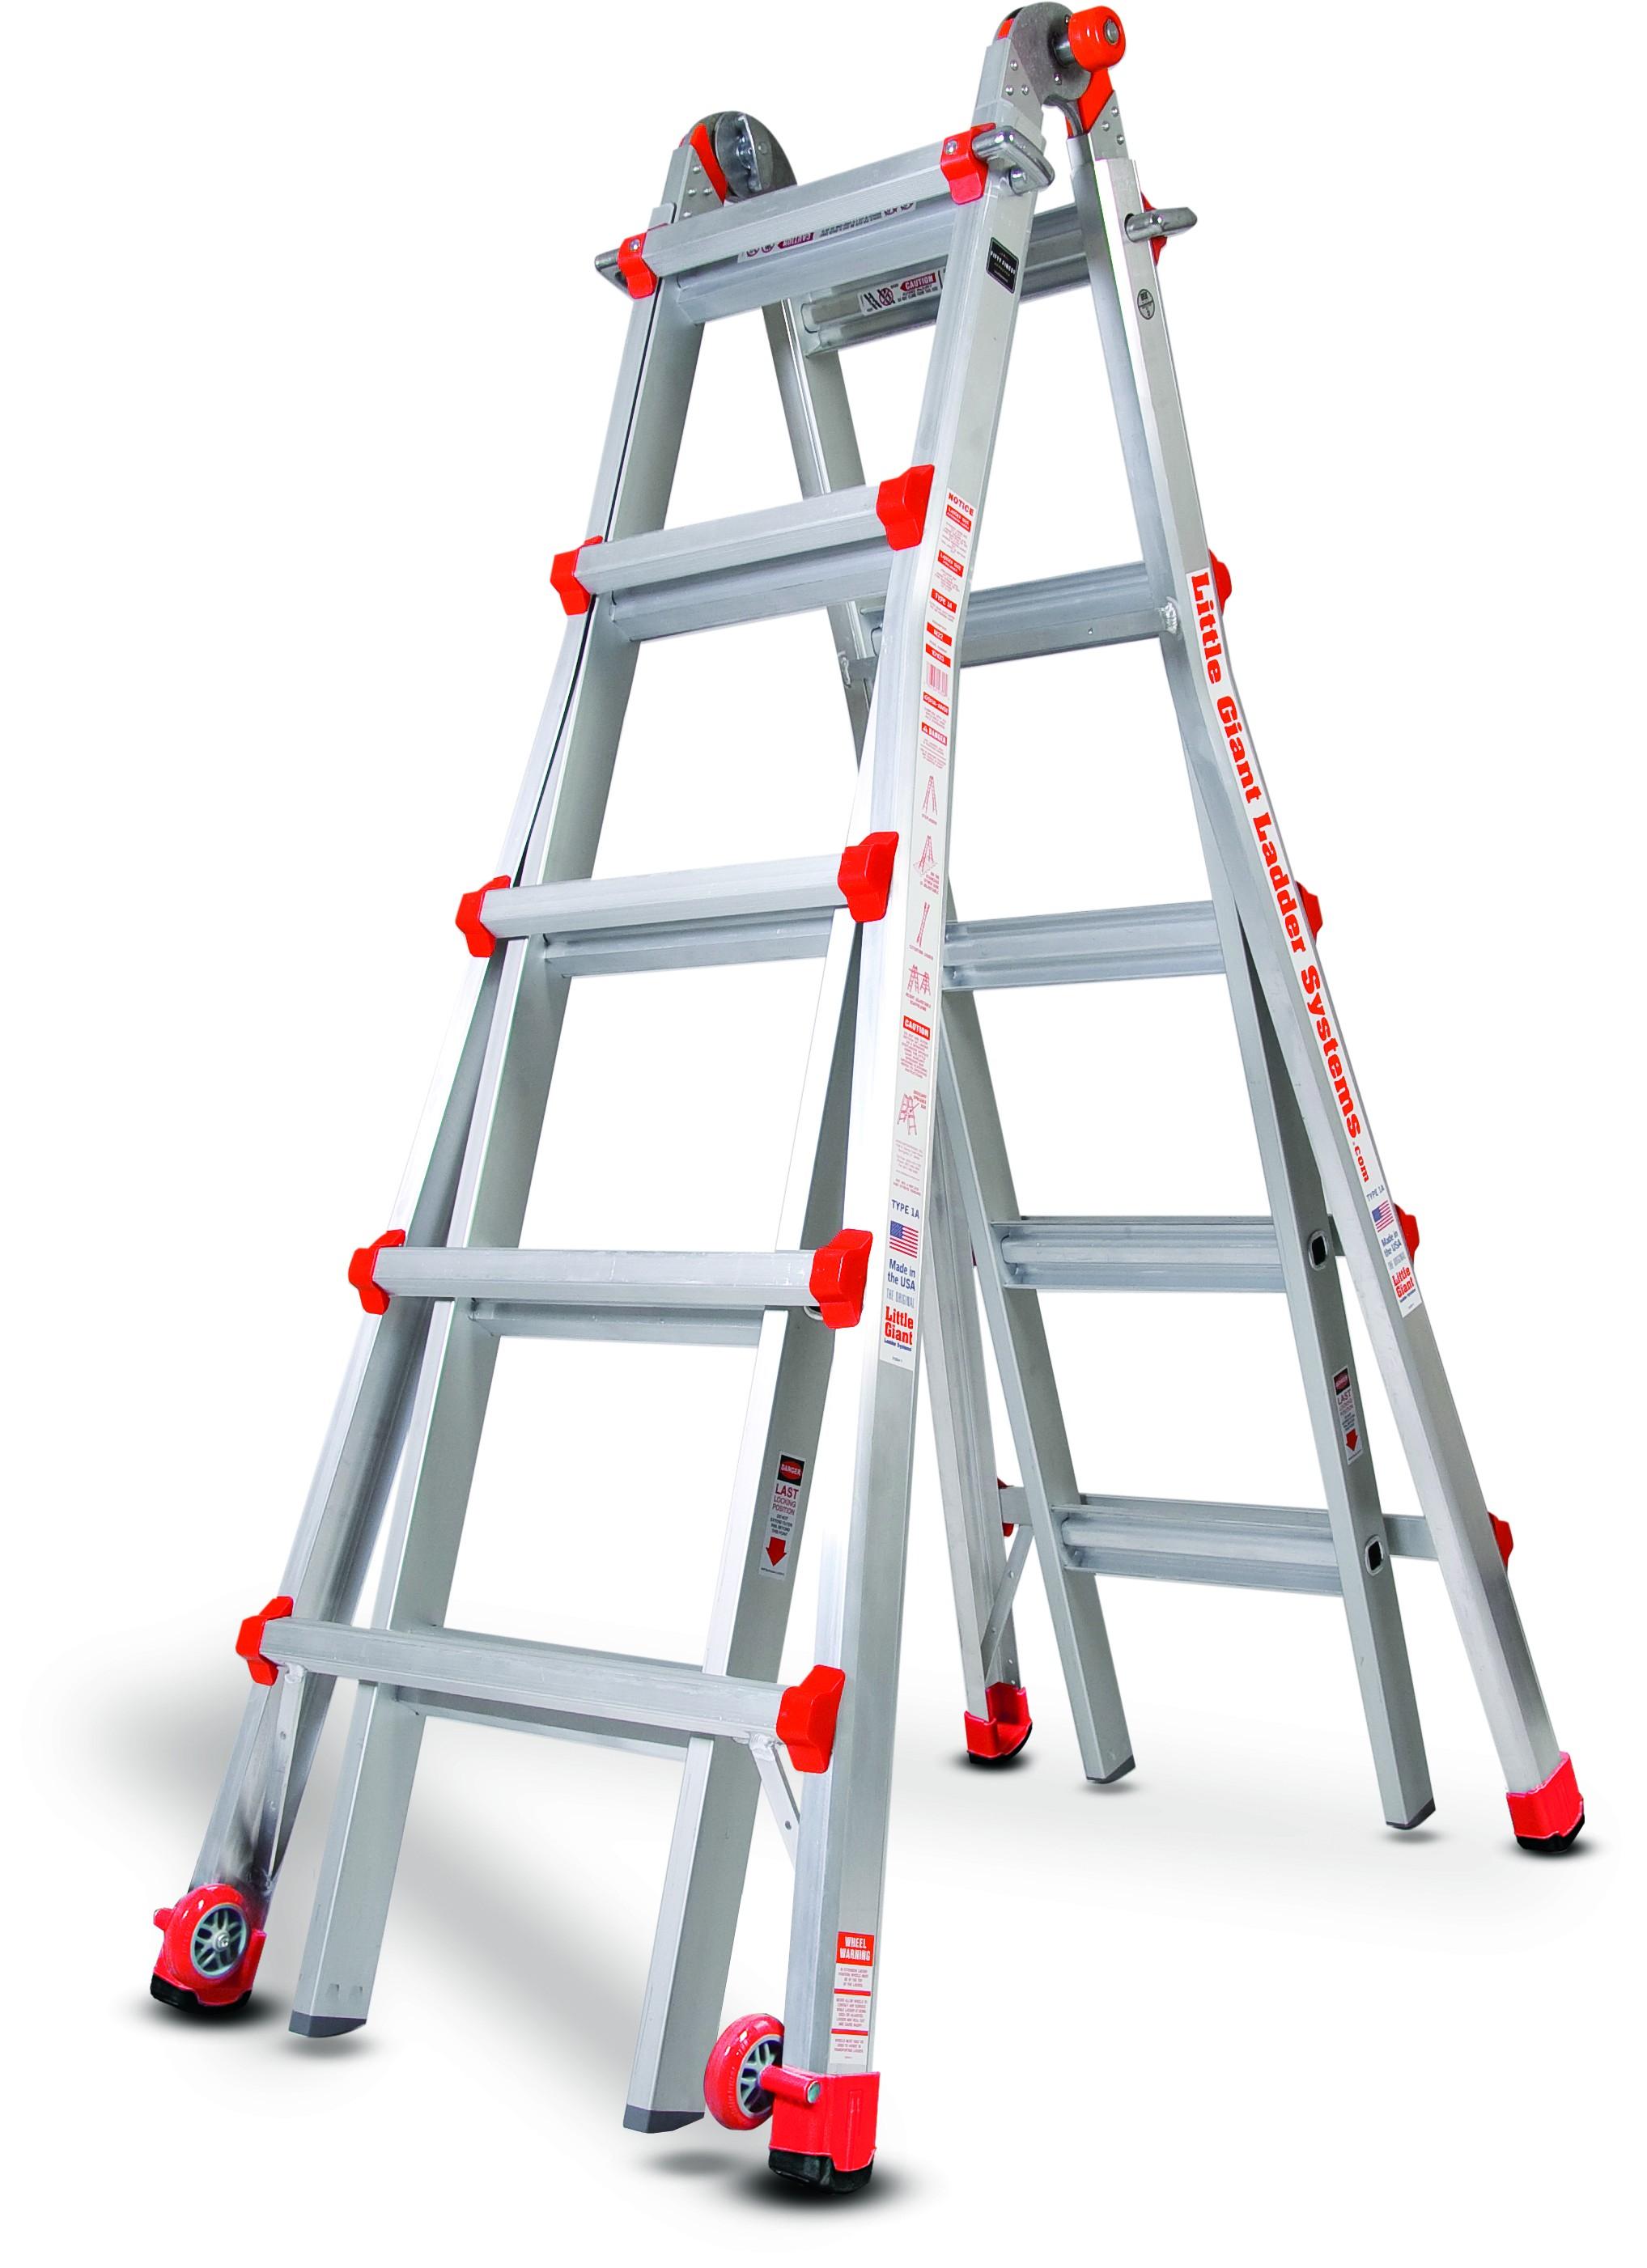 Calico Ladders Little Giant Ladders 10103lg M22 Aluminum